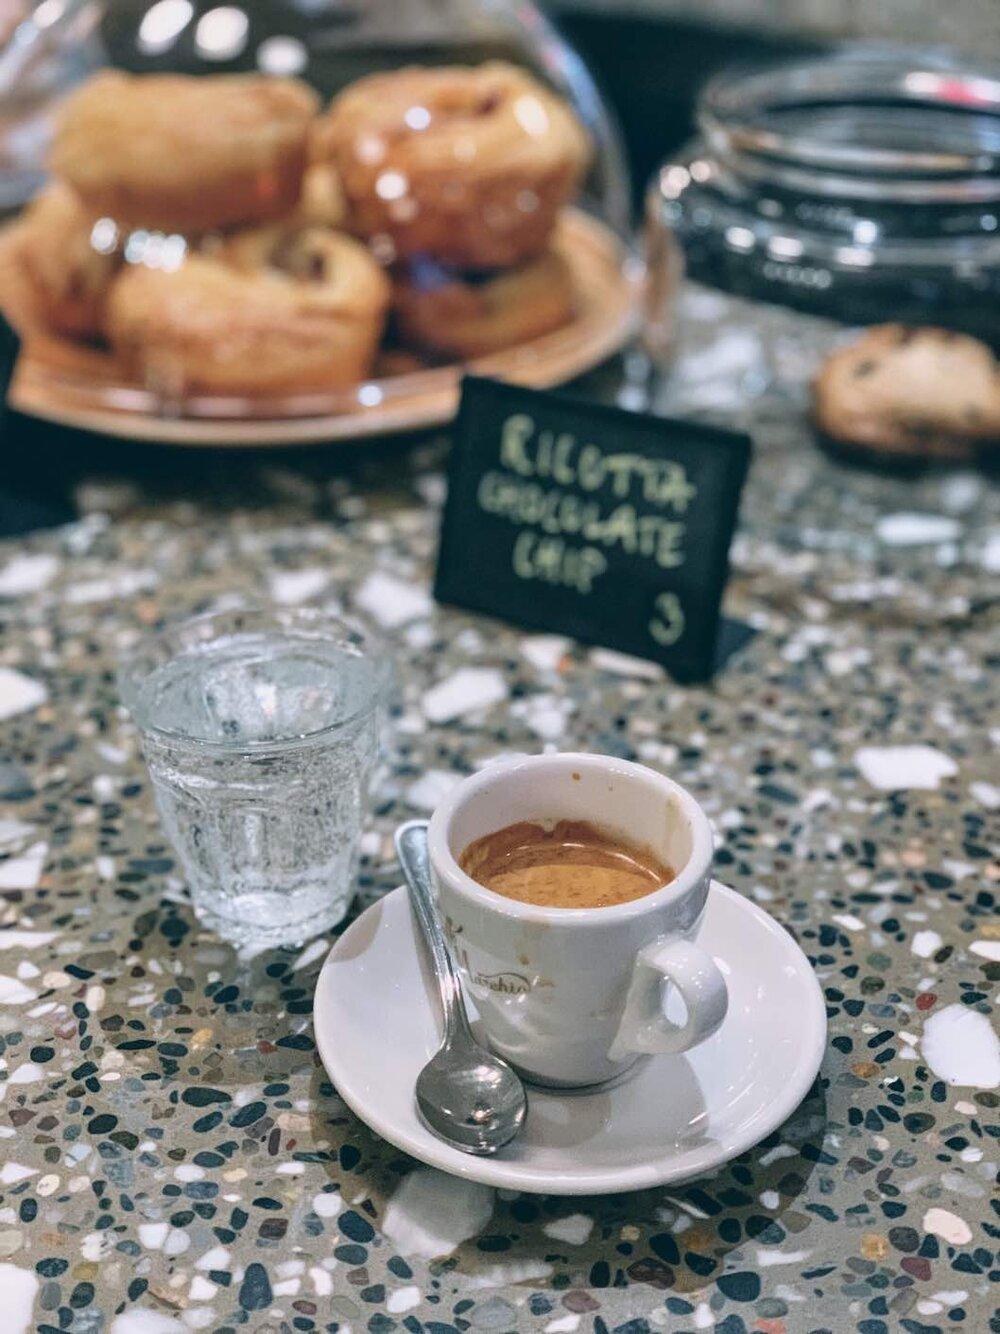 CaffeMarchio2CNewYork-TravelFoodPeople.jpg